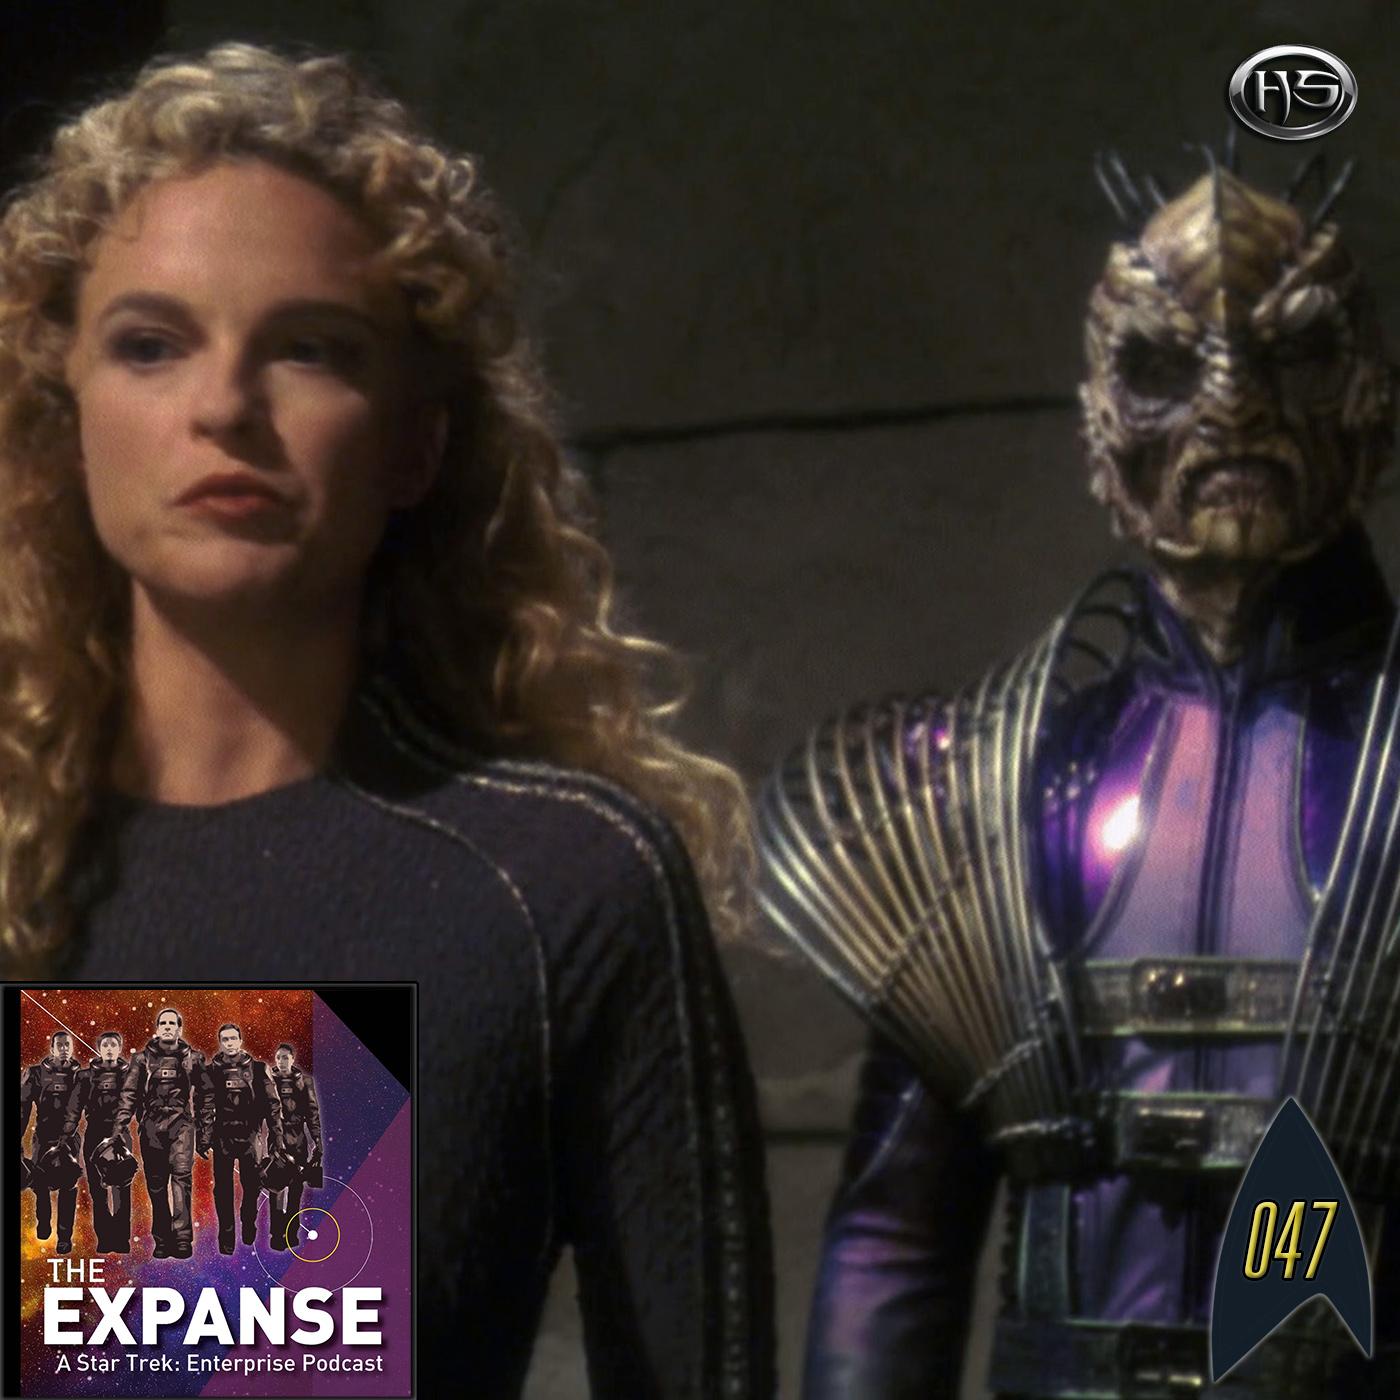 The Expanse Episode 47